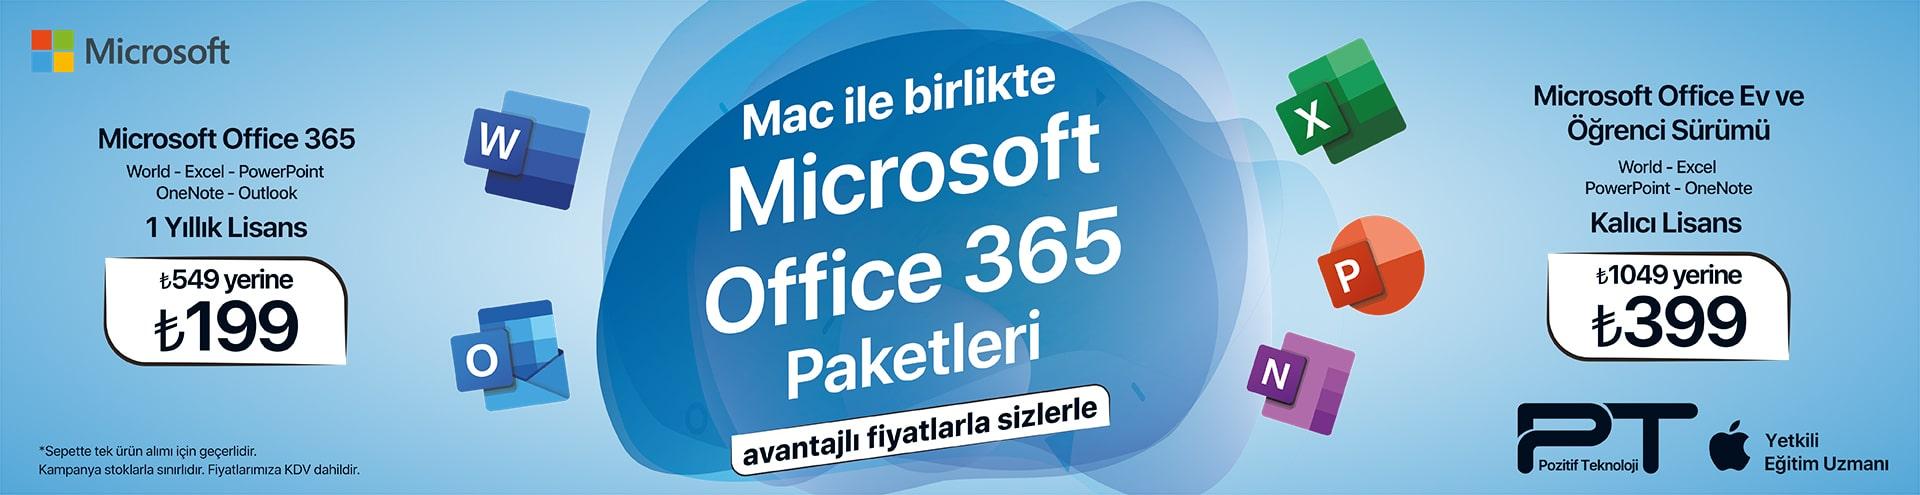 Microsoft MAC